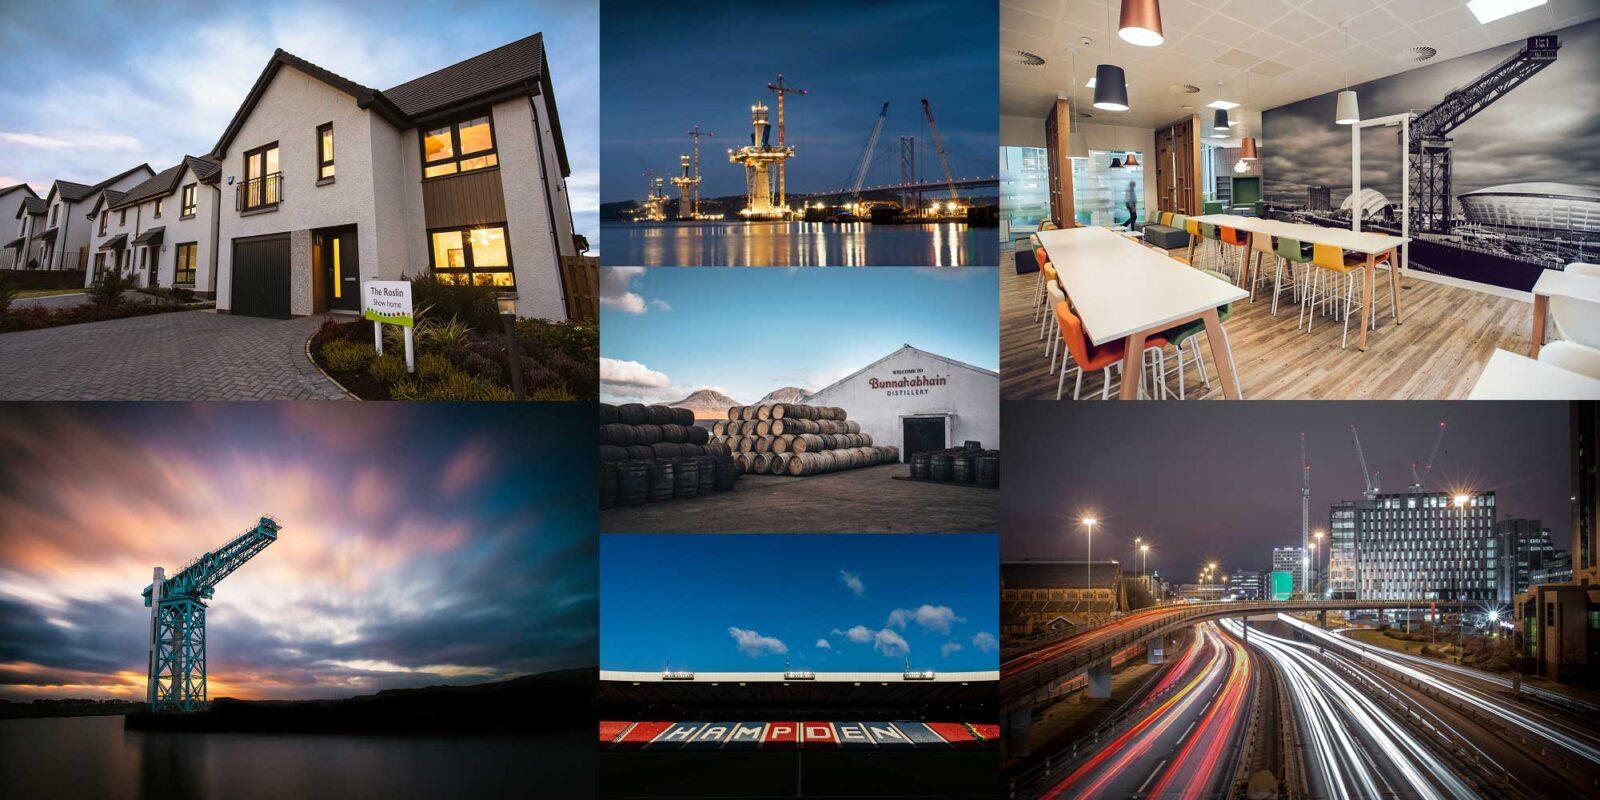 architectural-photographer-glasgow-bk-photography